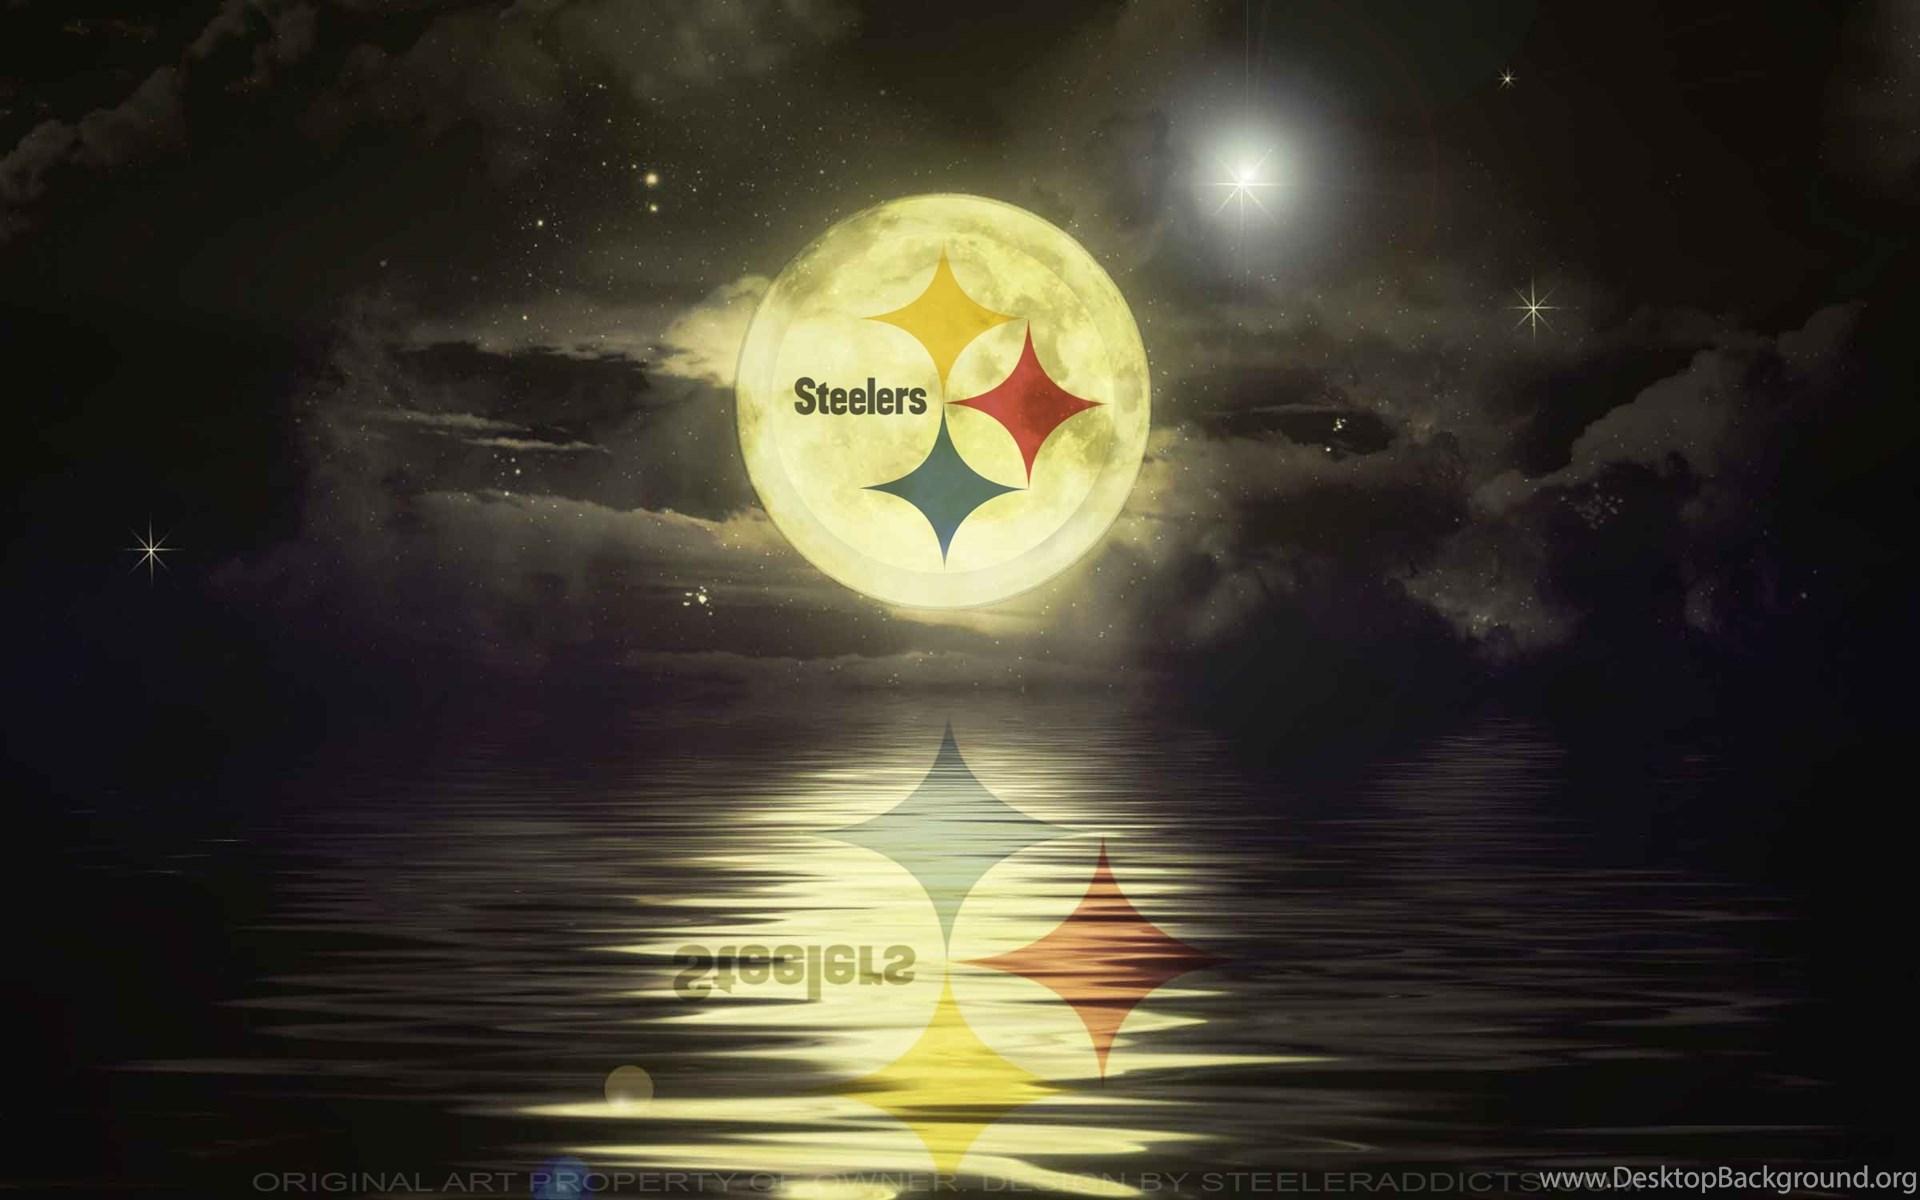 Steelers wallpapers dr odd desktop background widescreen voltagebd Images